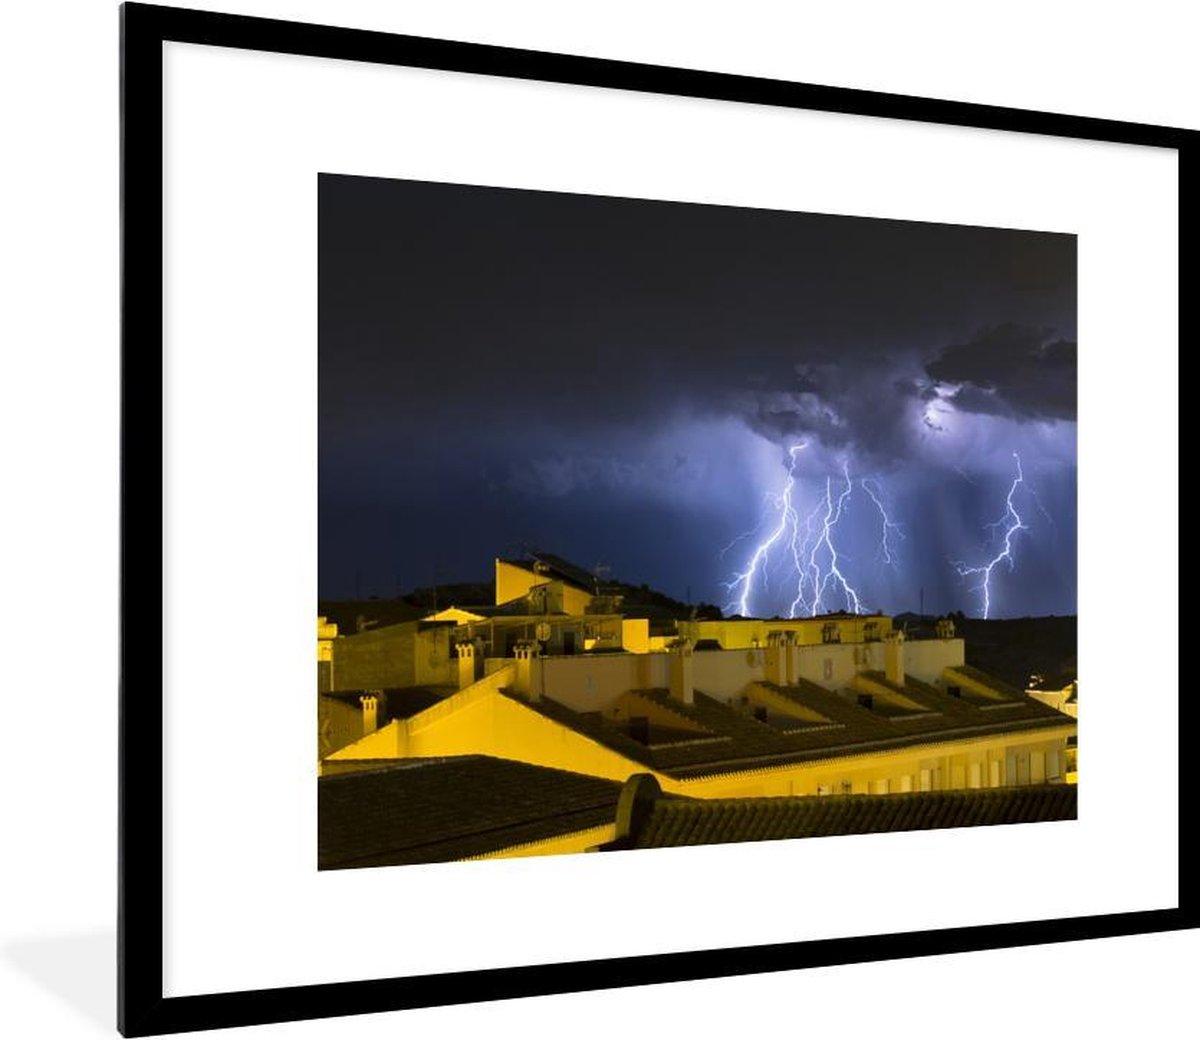 Foto in lijst - Onweersbui boven dubbelwoningen fotolijst 80x60 cm - Poster in lijst